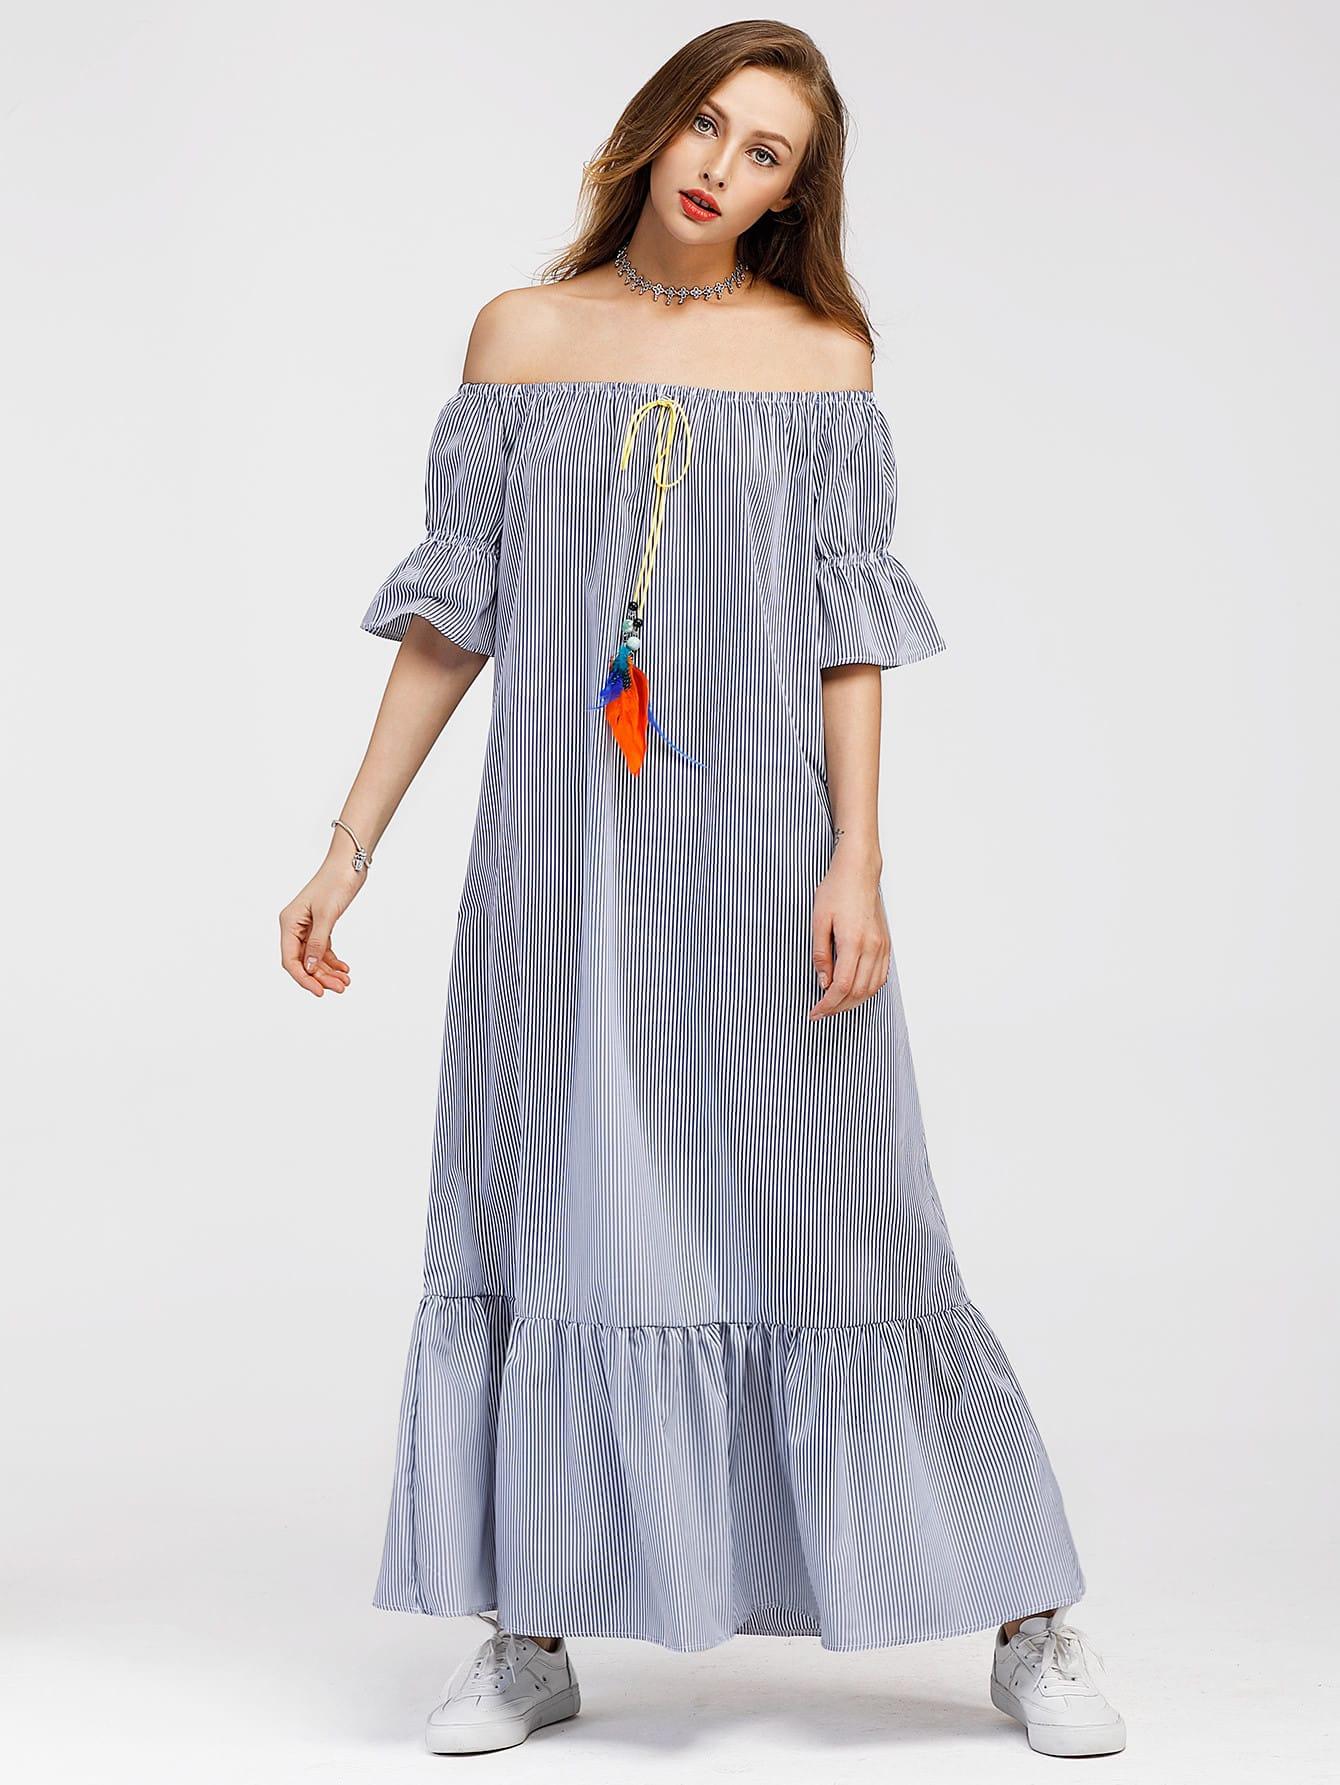 Bardot Frill Trim Tie Detail Pinstriped Dress embroidered tape detail beading trim bardot top